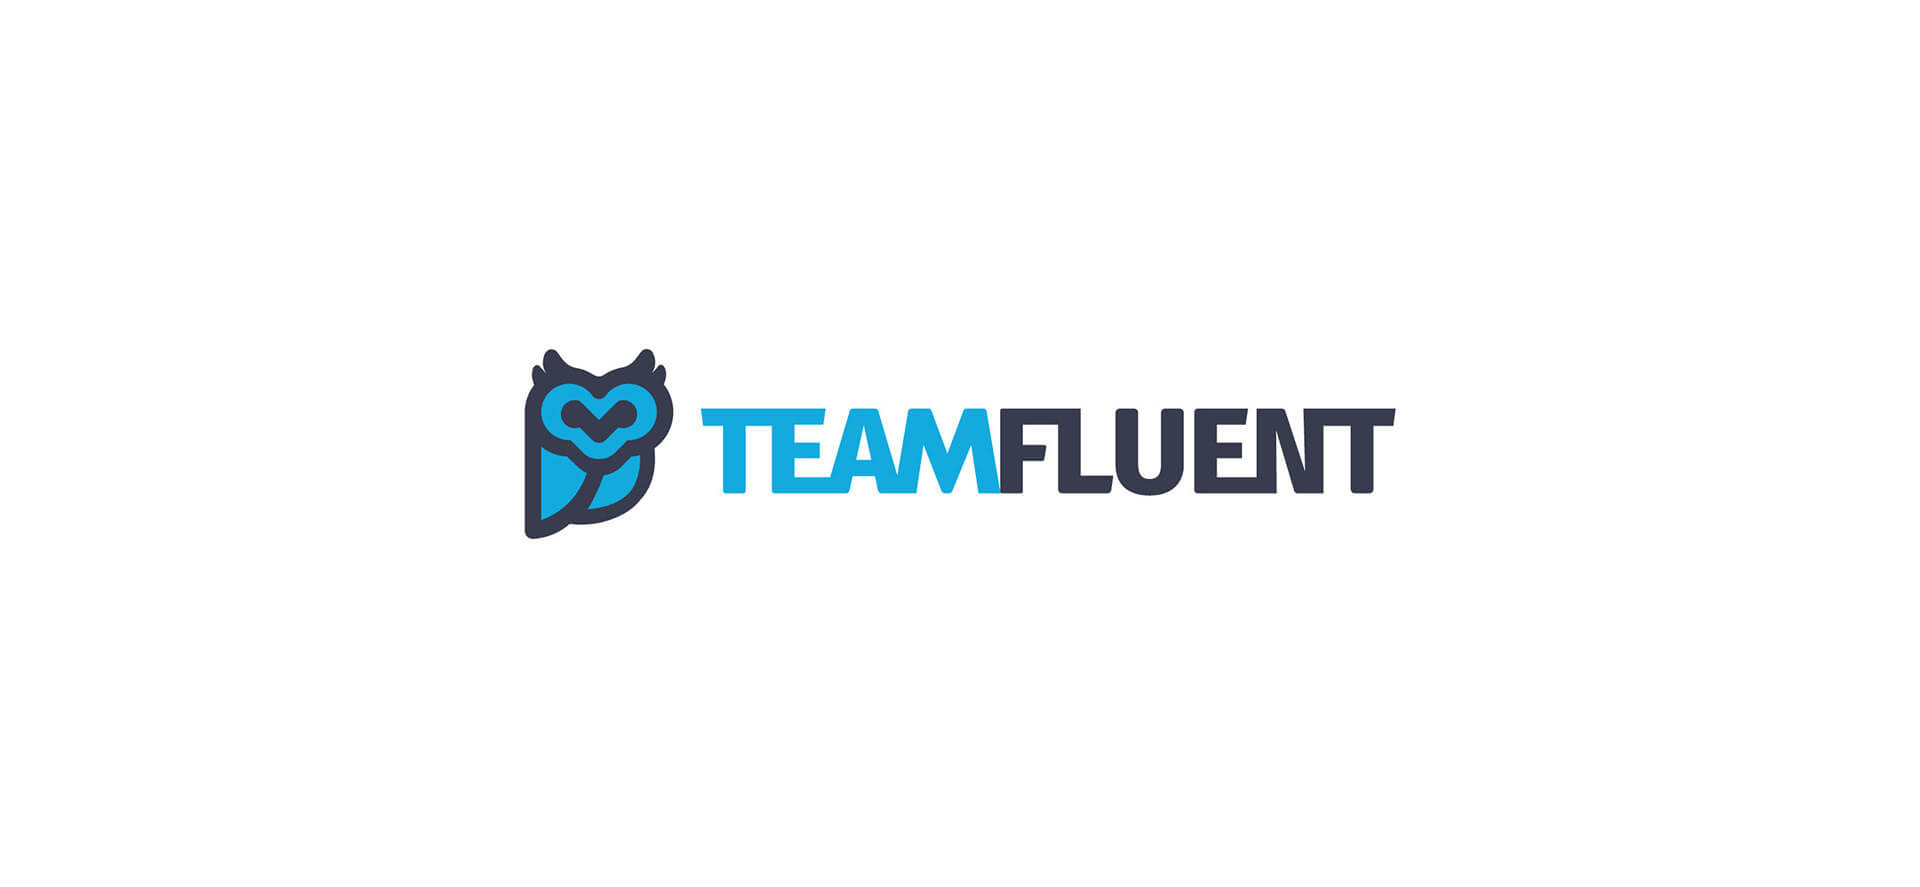 teamfluent-master-logo